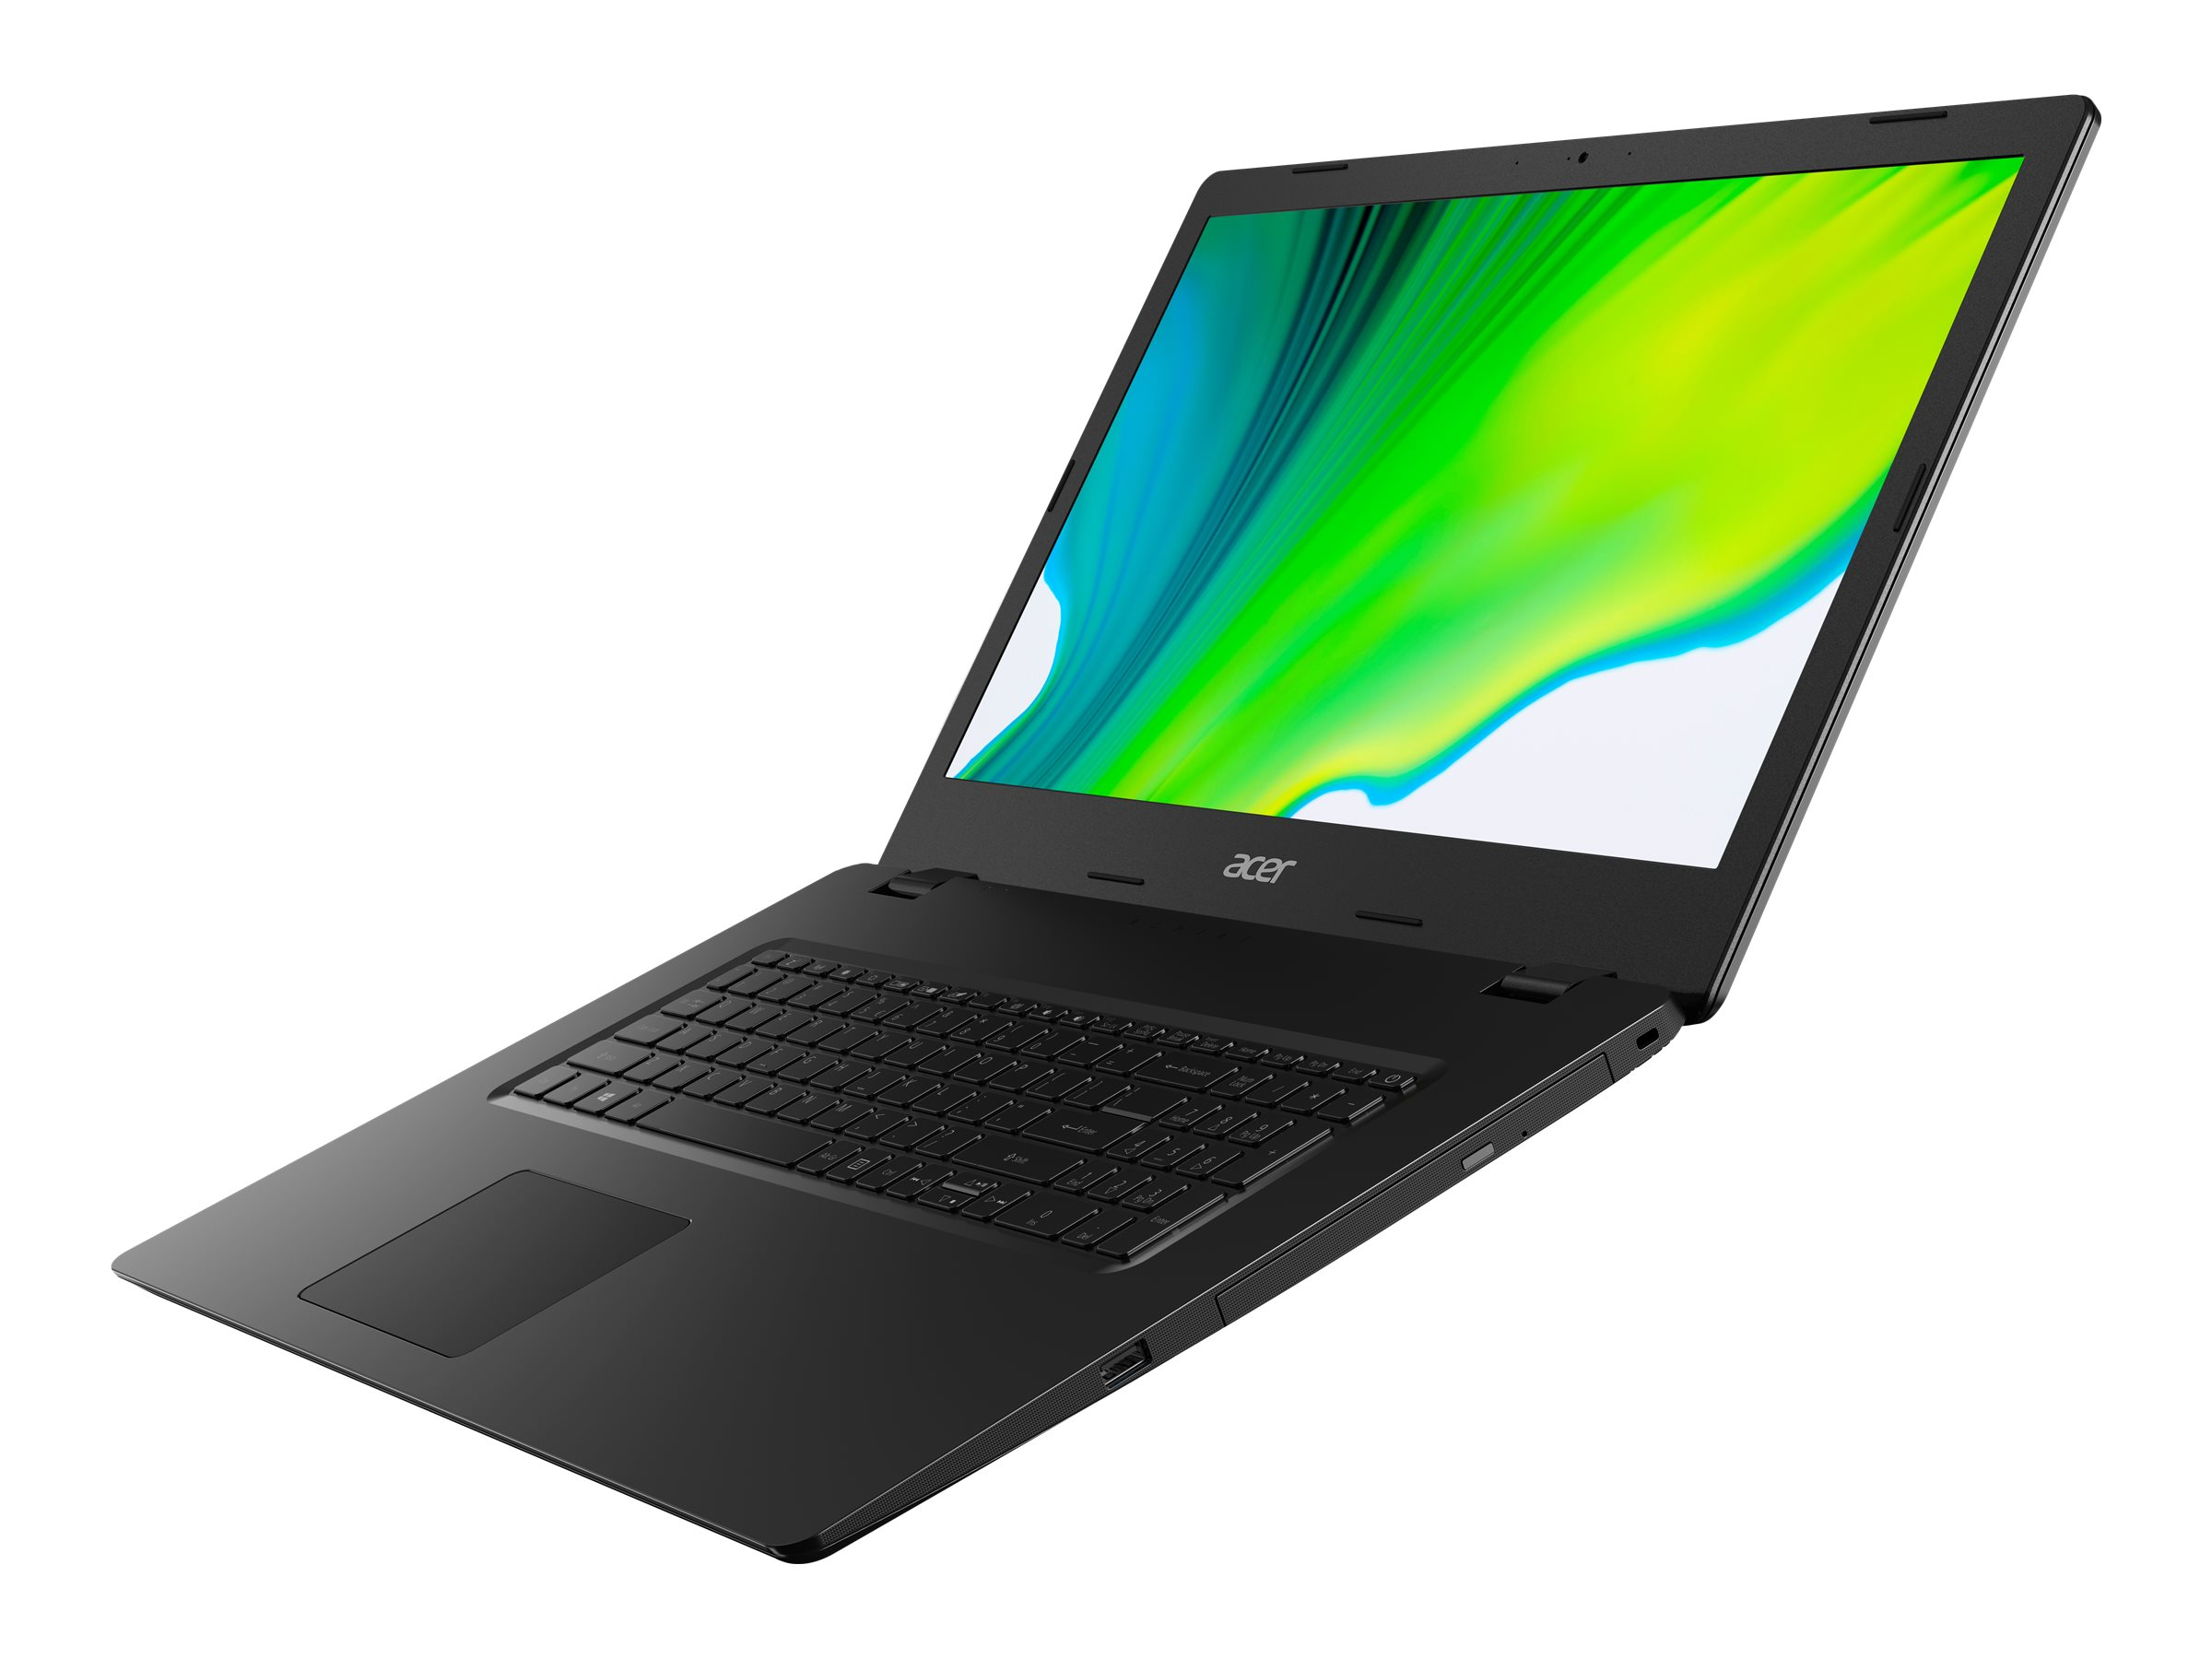 "Acer Aspire 3 A317-52-35V5 - Core i3 1005G1 / 1.2 GHz - ESHELL - 8 GB RAM - 256 GB SSD - DVD-Writer - 43.9 cm (17.3"")"